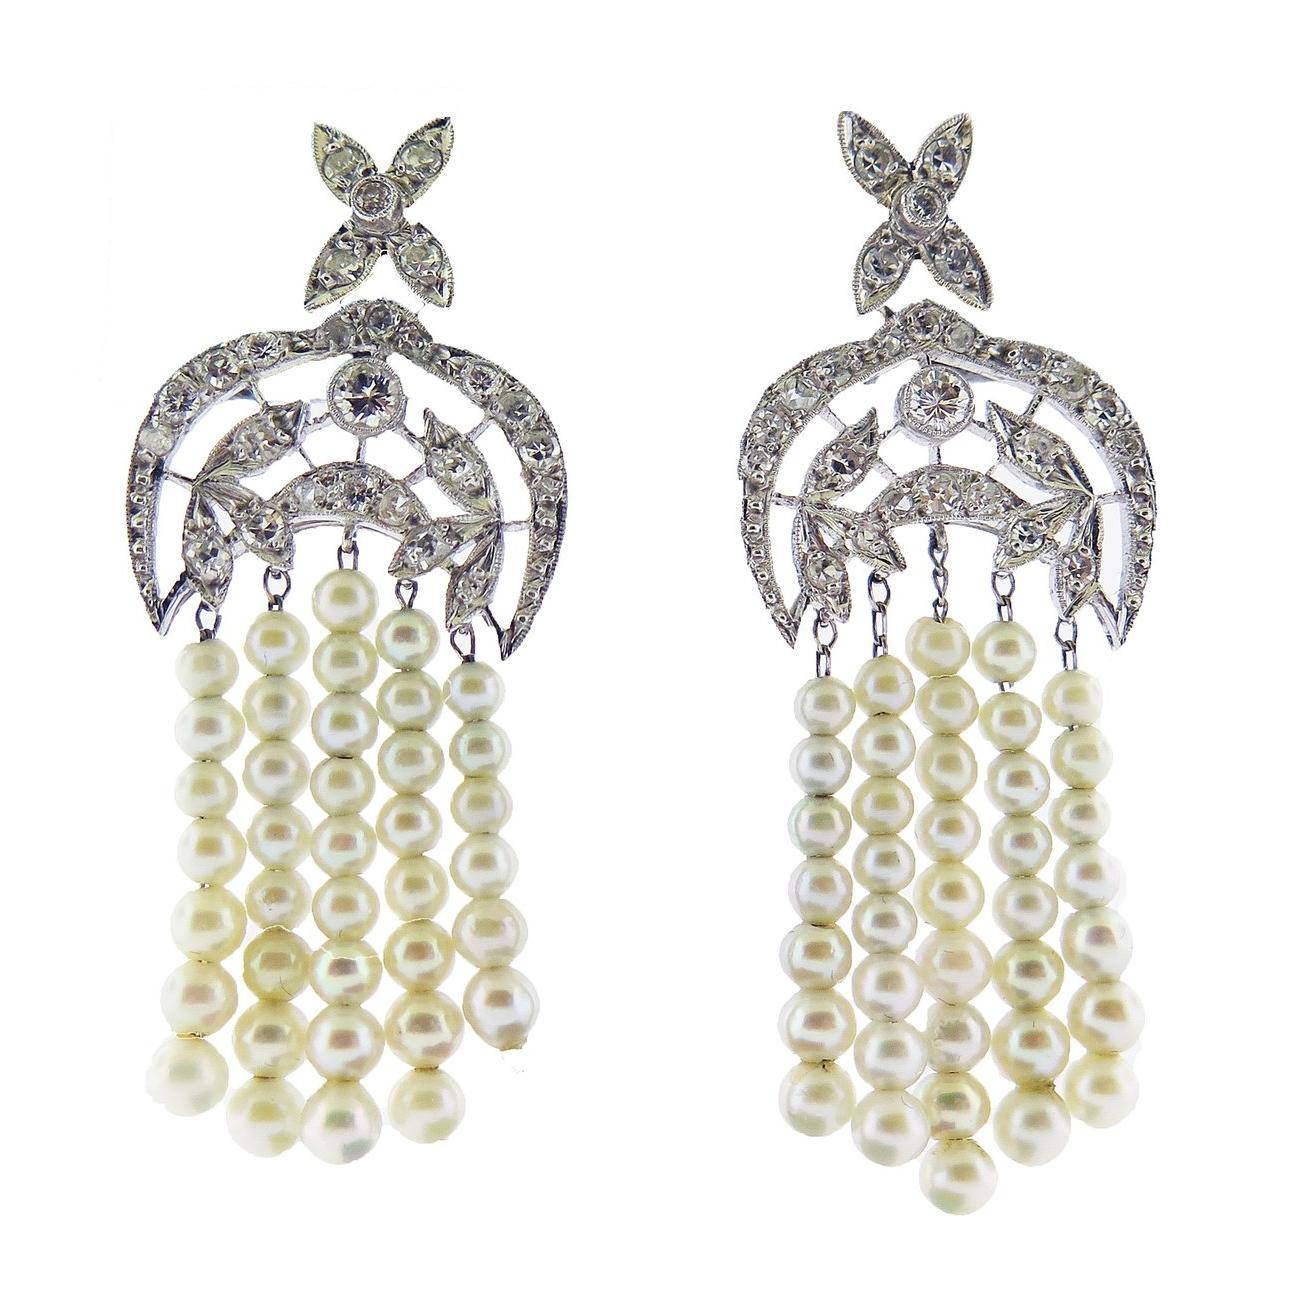 Diamond and Pearl Fringe Earrings